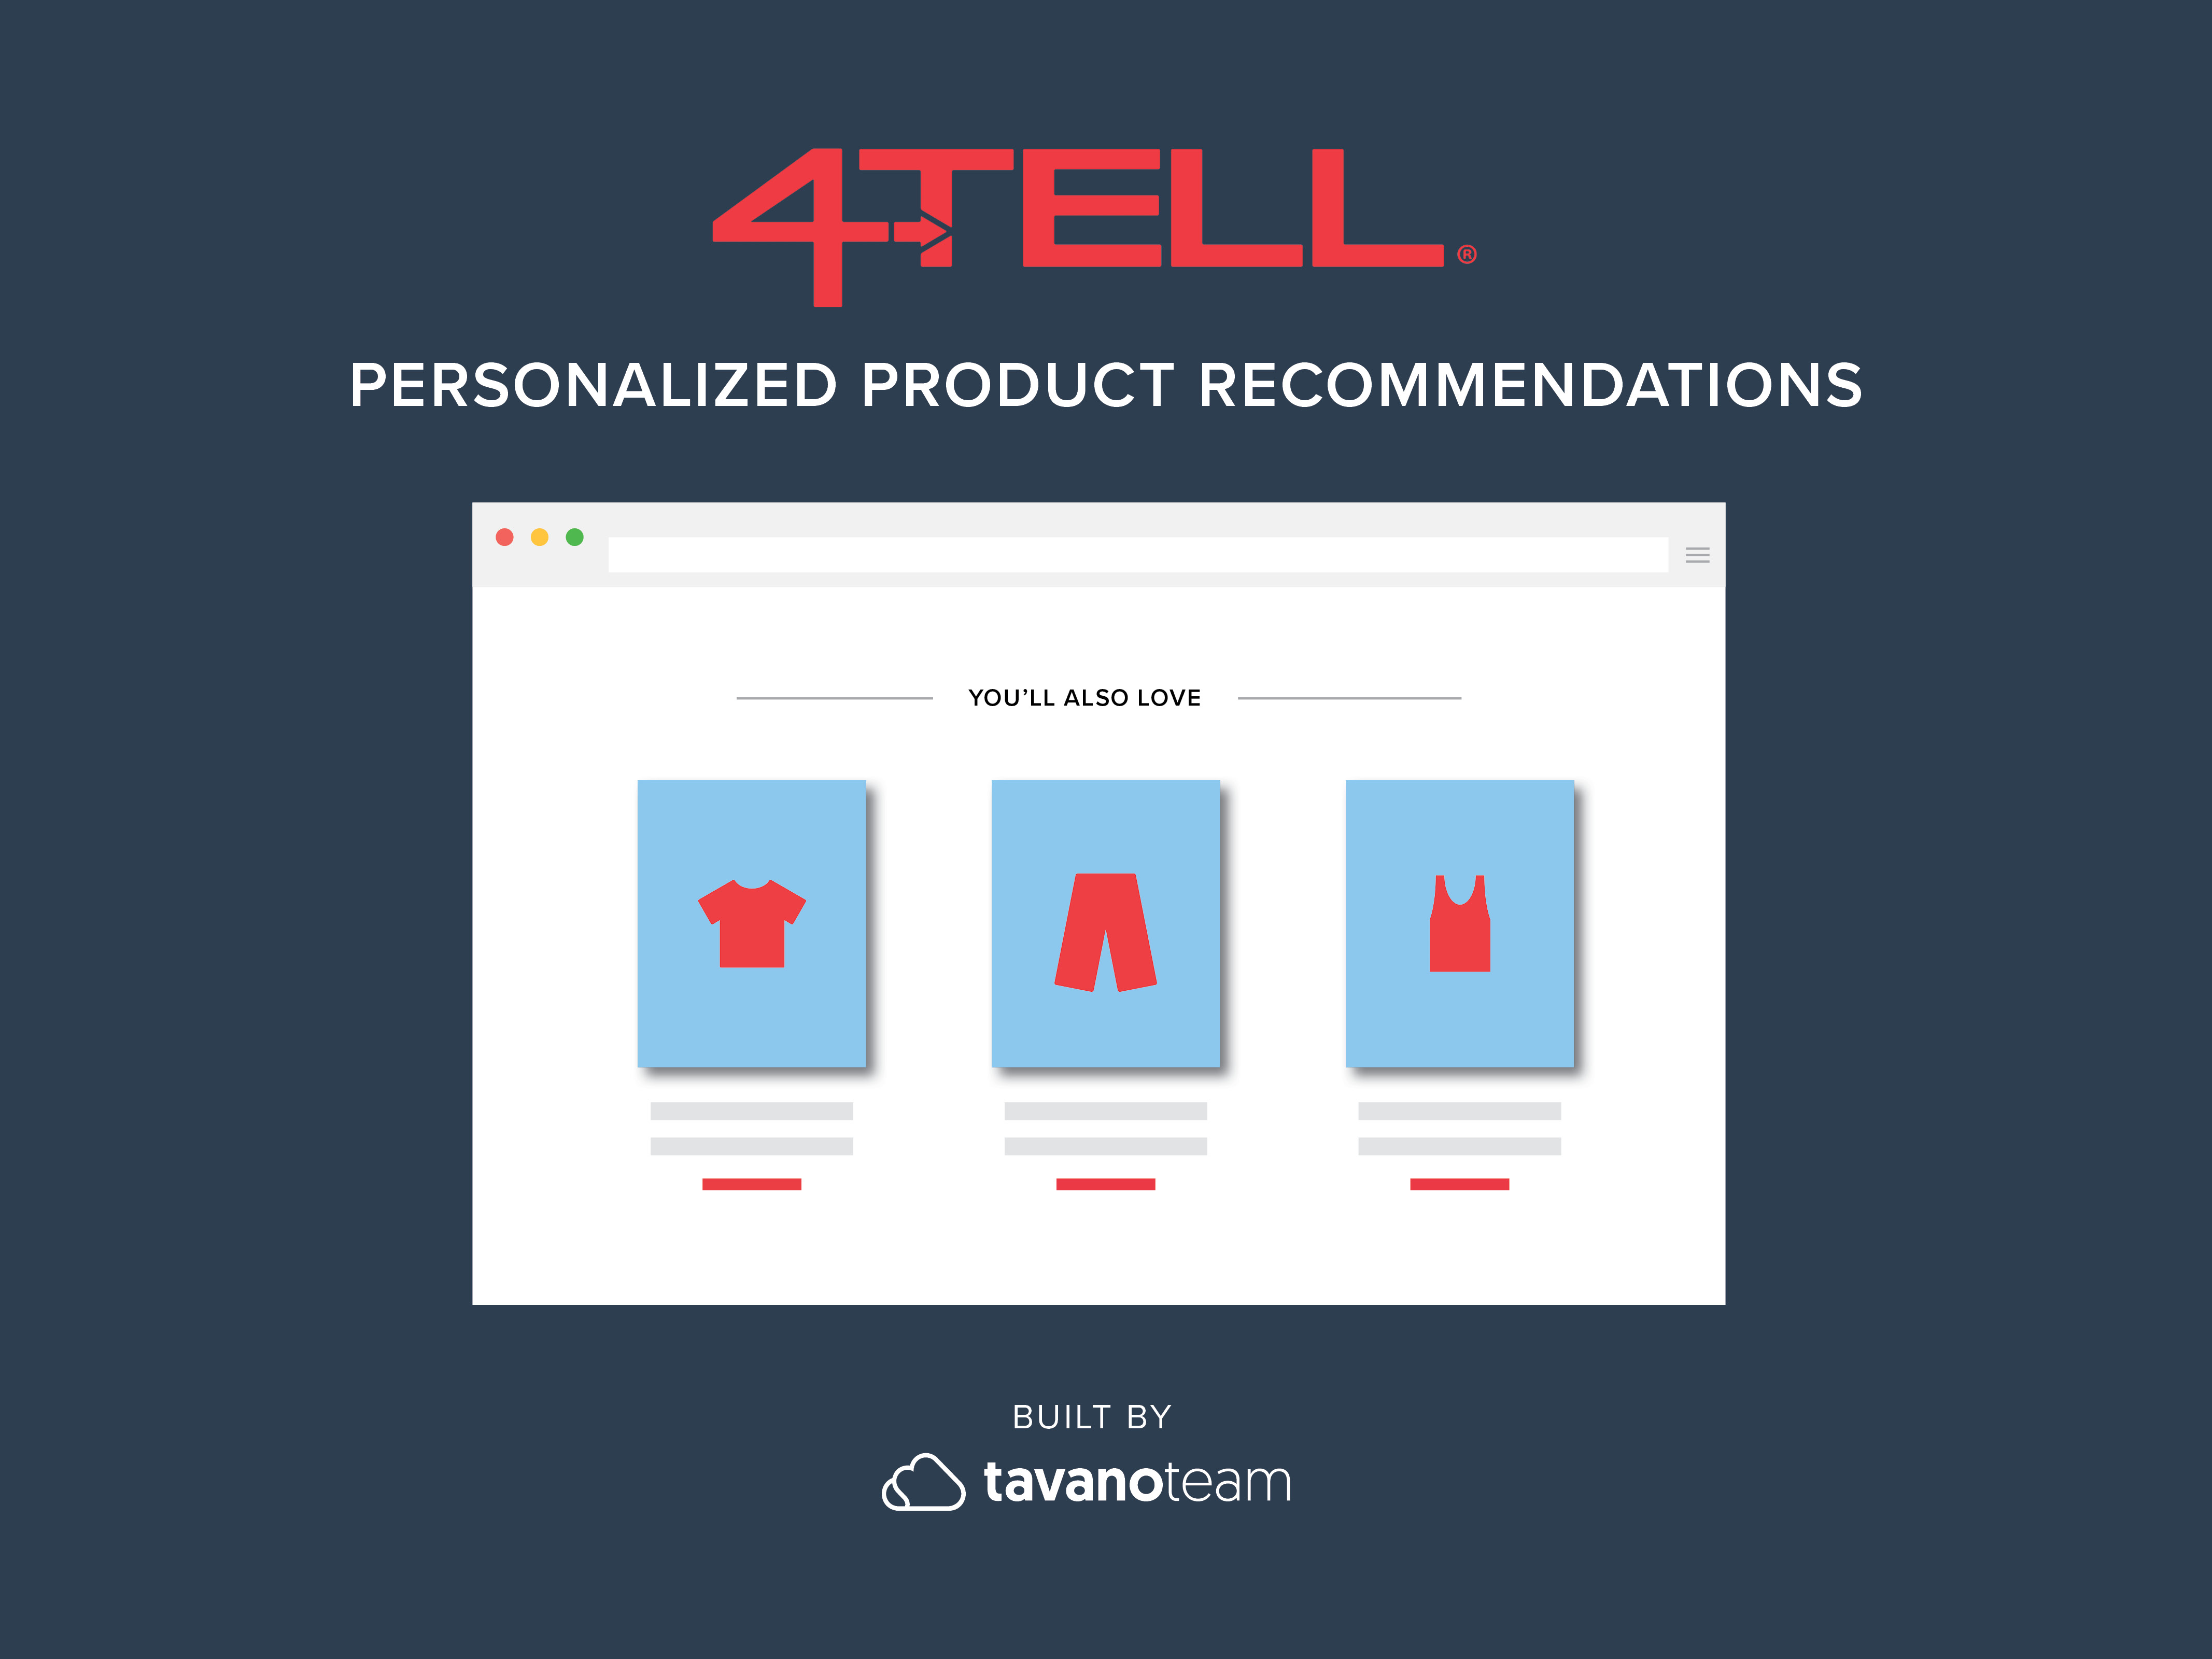 4-Tell-Personalization SuiteCommerce Tavano Team NetSuite